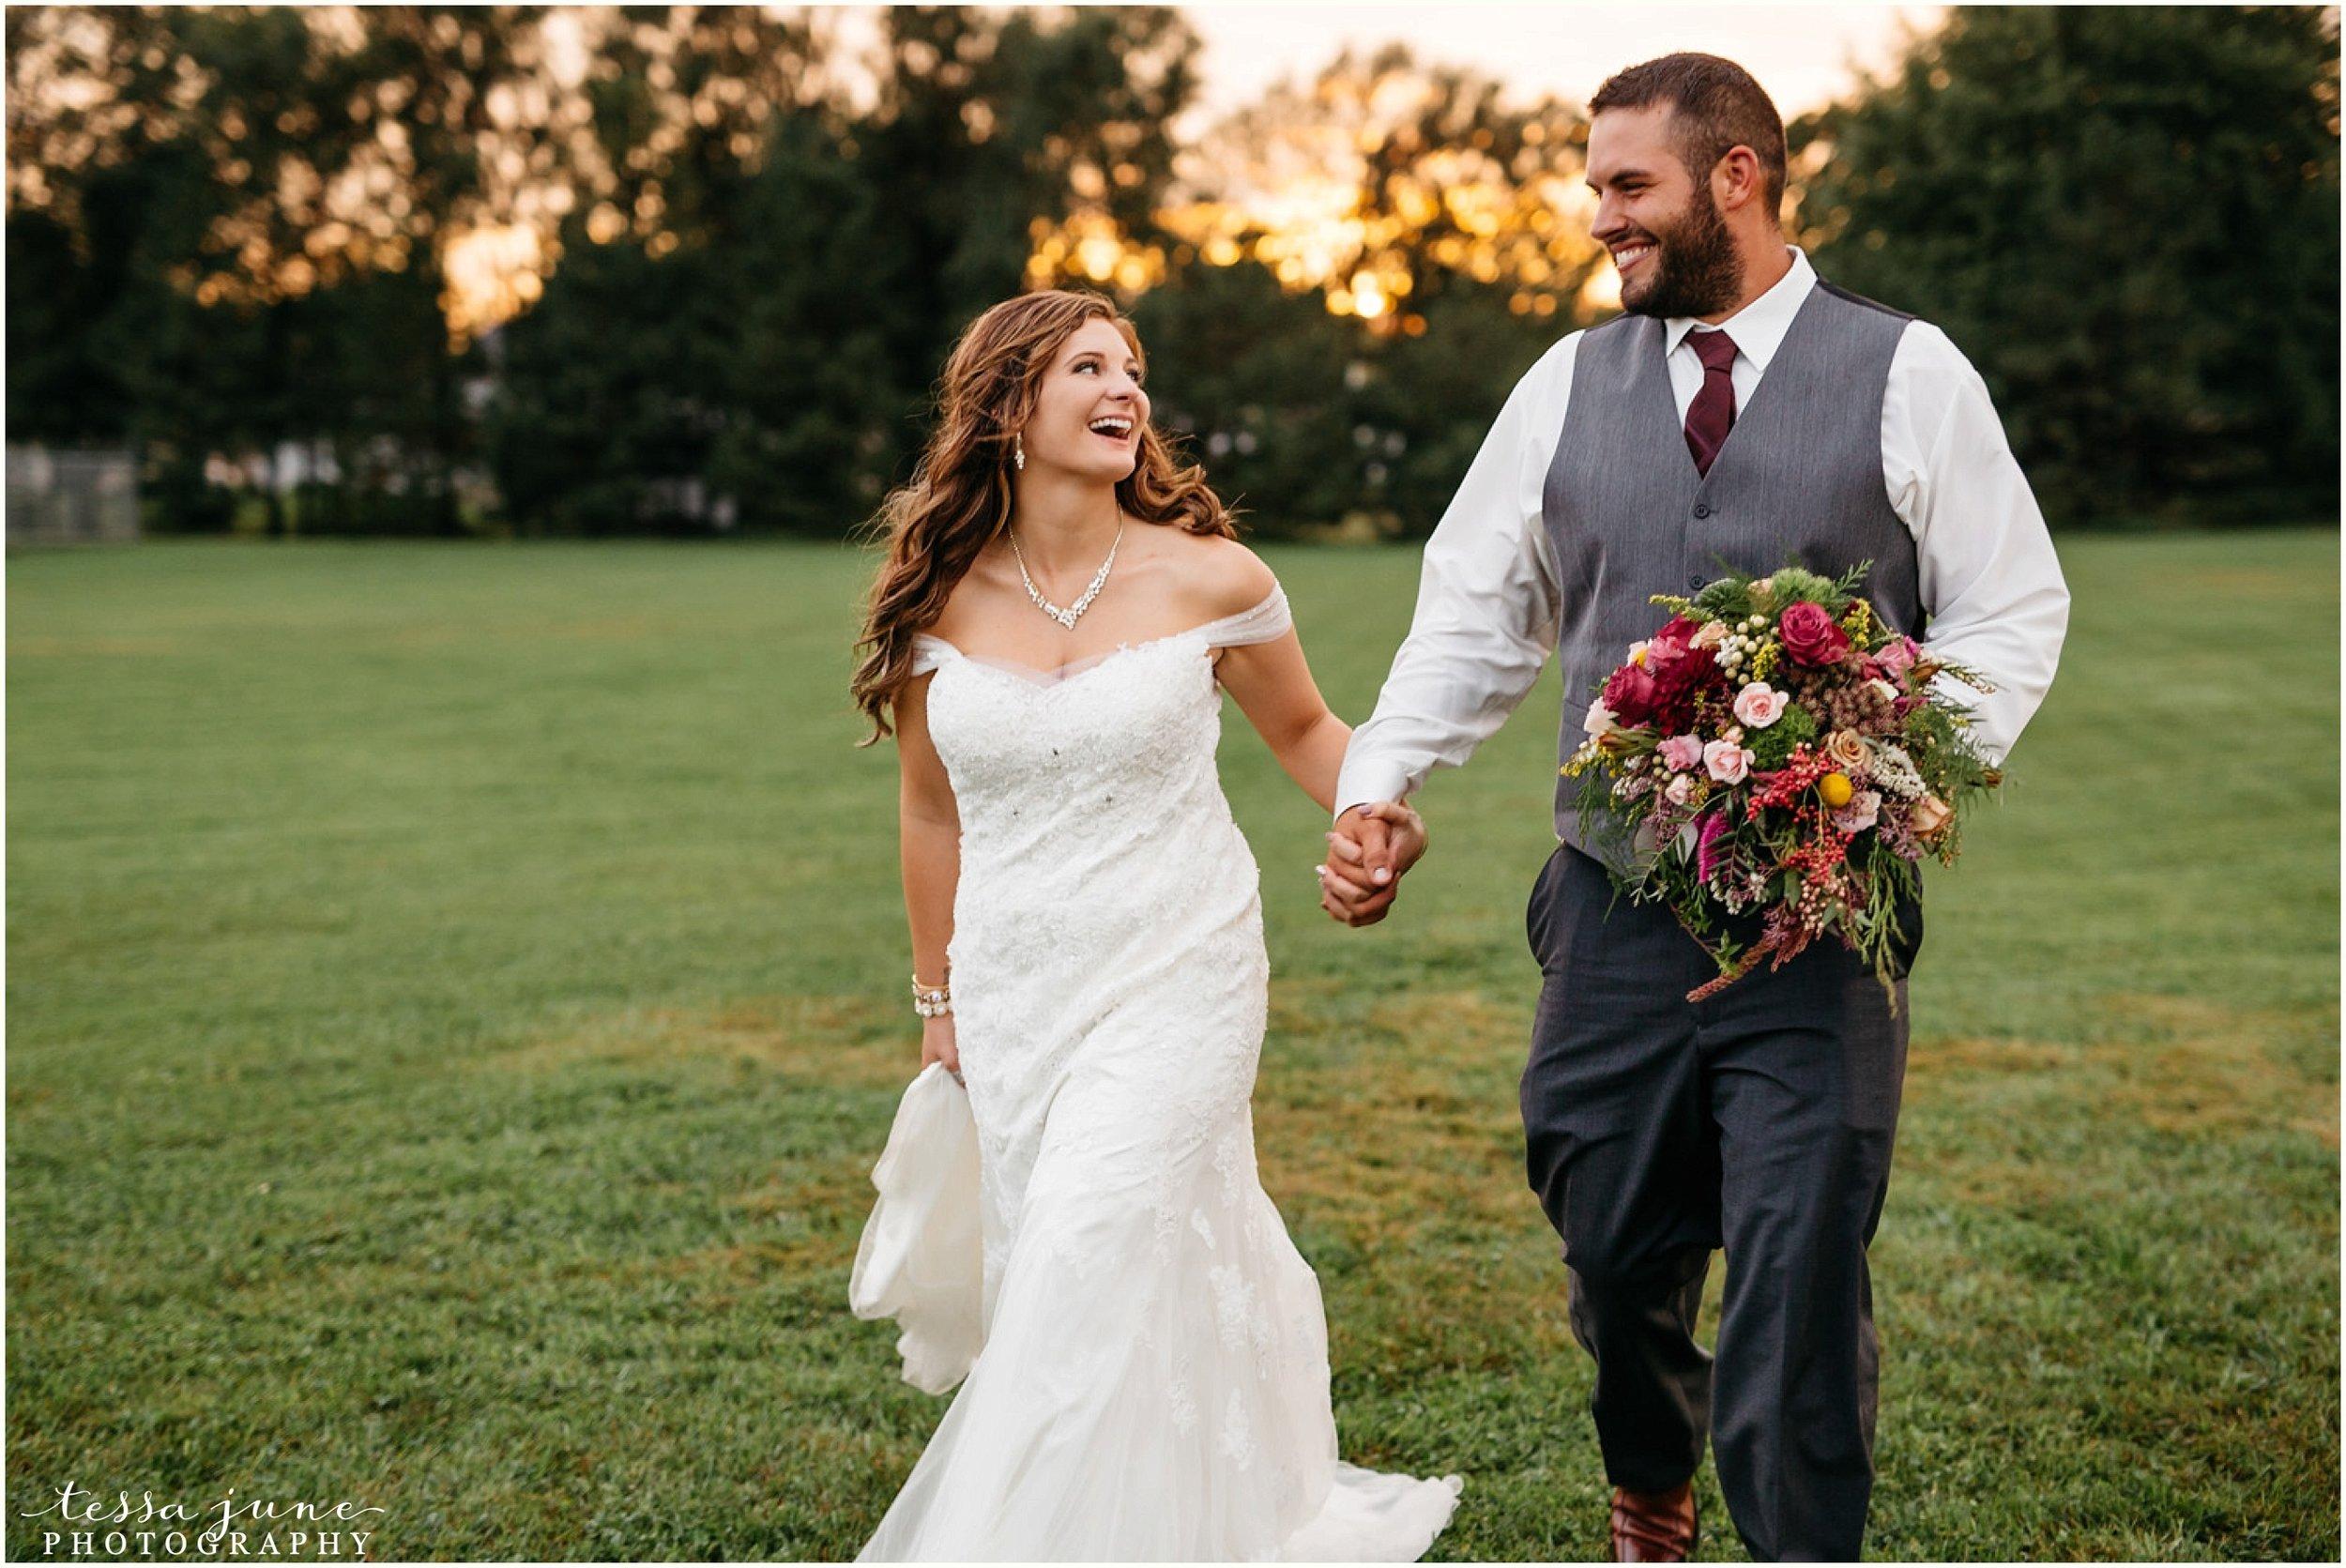 bohemian-minnesota-wedding-mismatched-bridesmaid-dresses-waterfall-st-cloud-tessa-june-photography-183.jpg